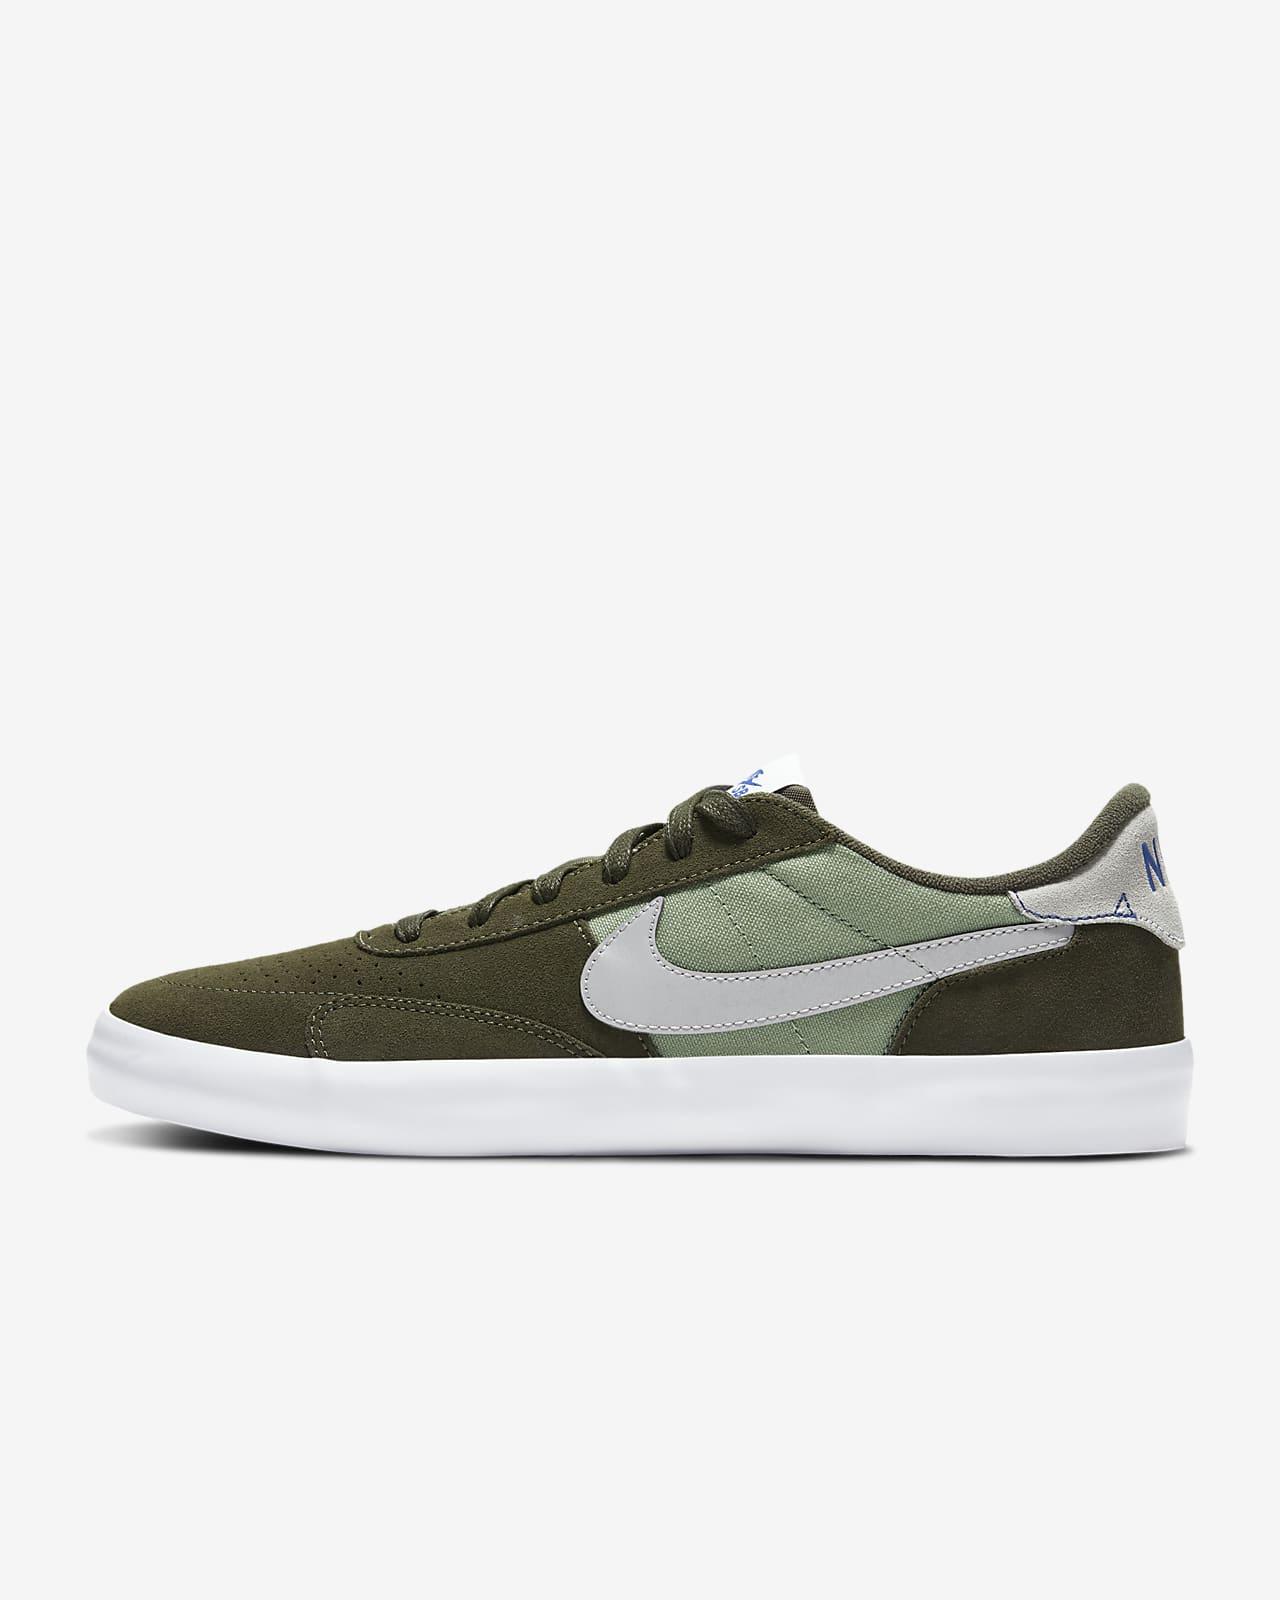 Nike SB Heritage Vulc Premium Skate Shoe